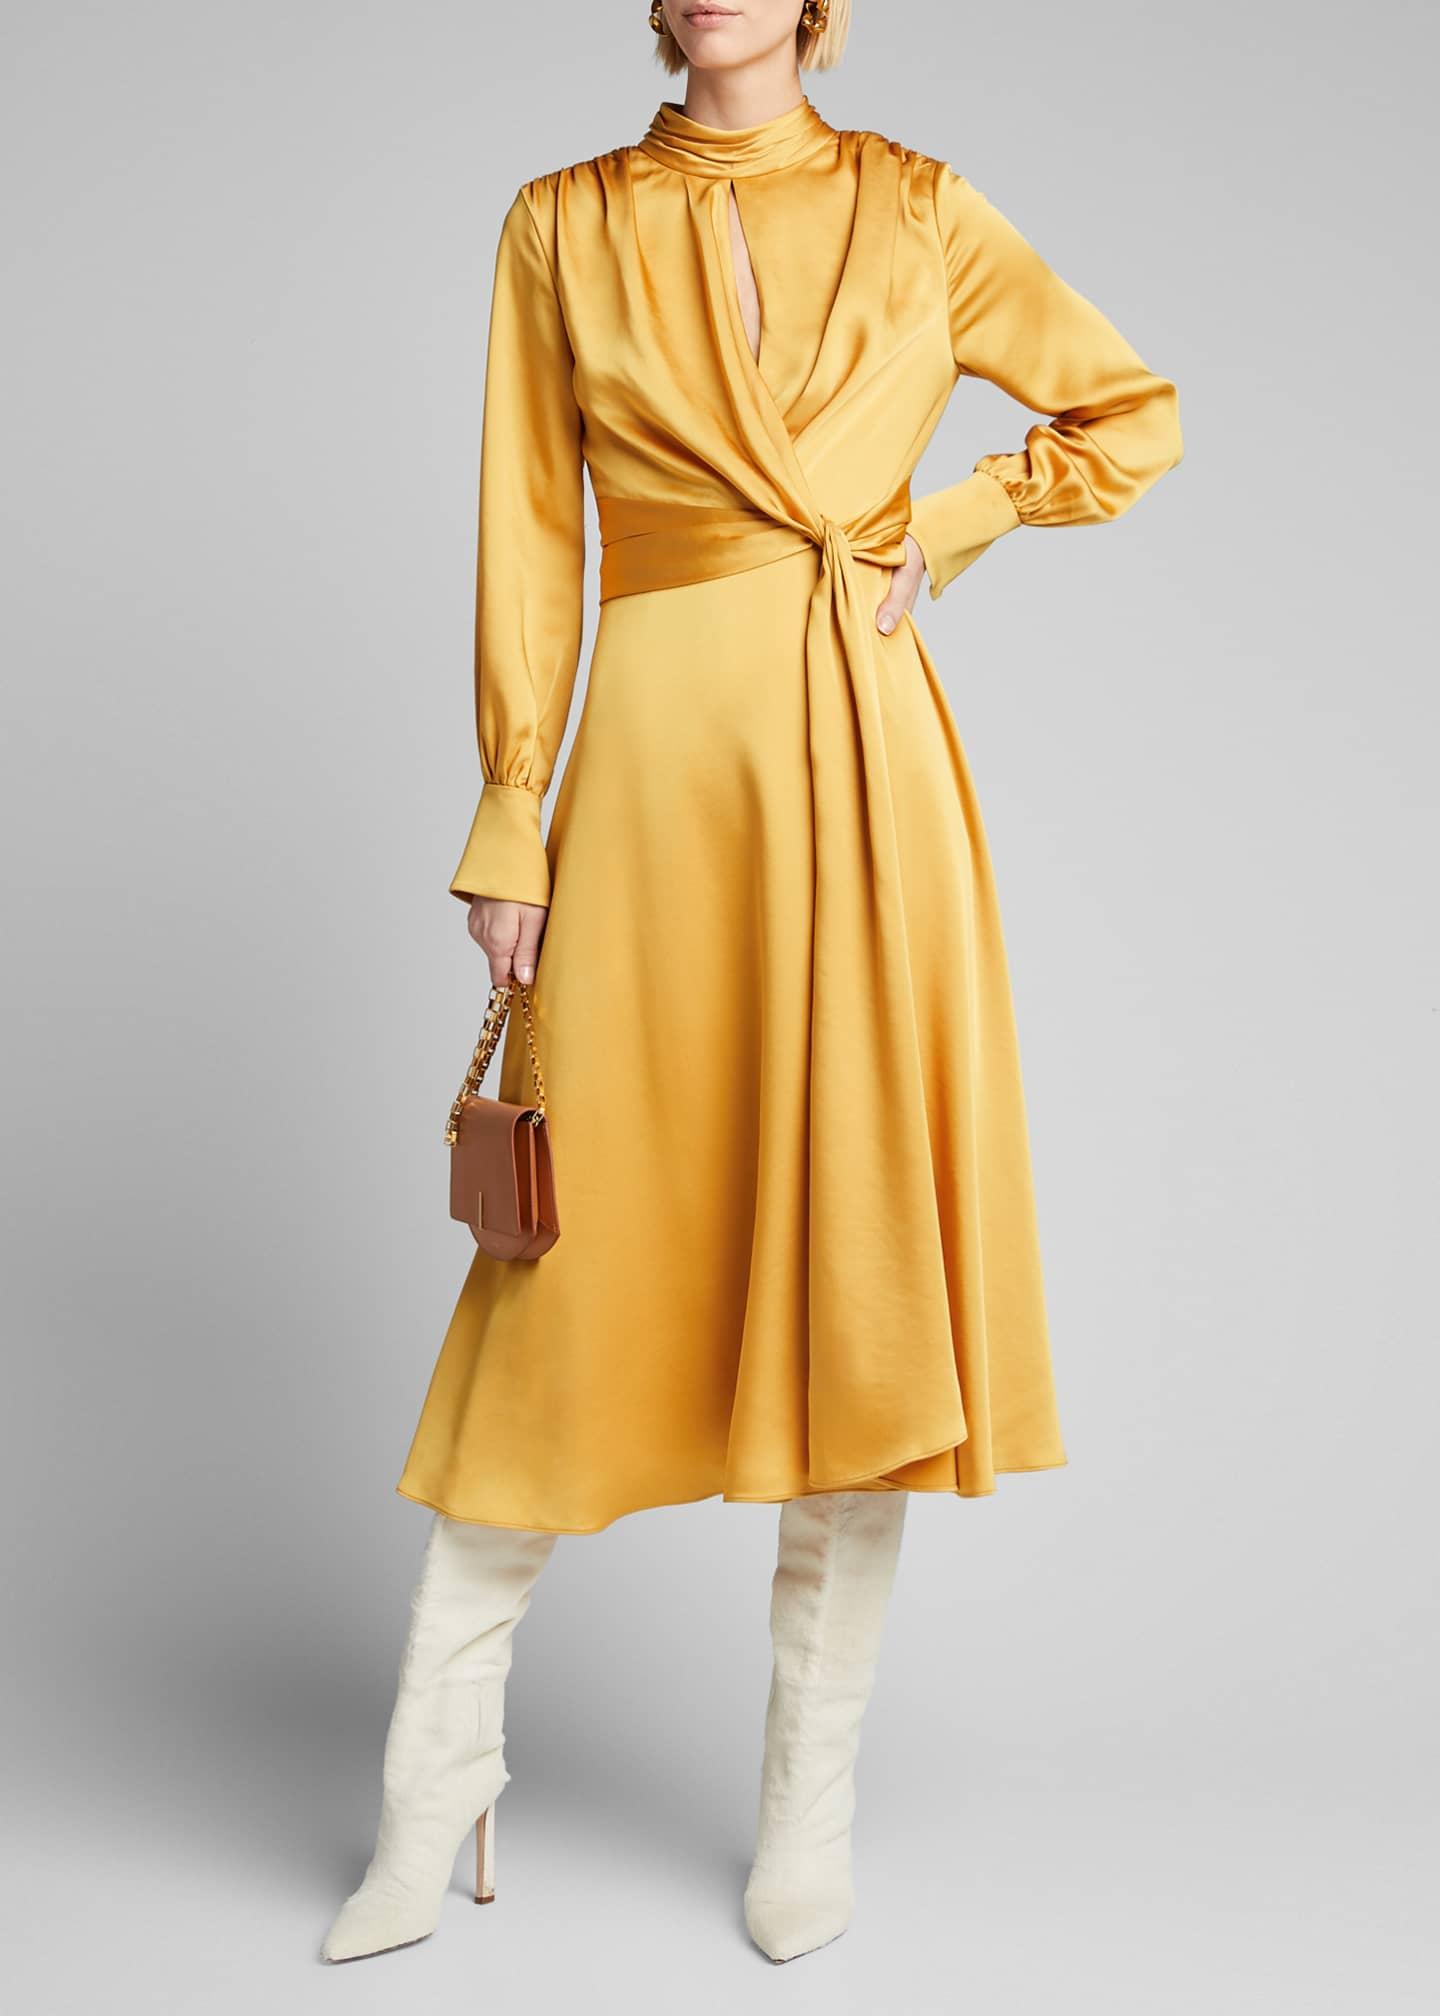 Jonathan Simkhai Fluid Satin Tie-Front Midi Dress